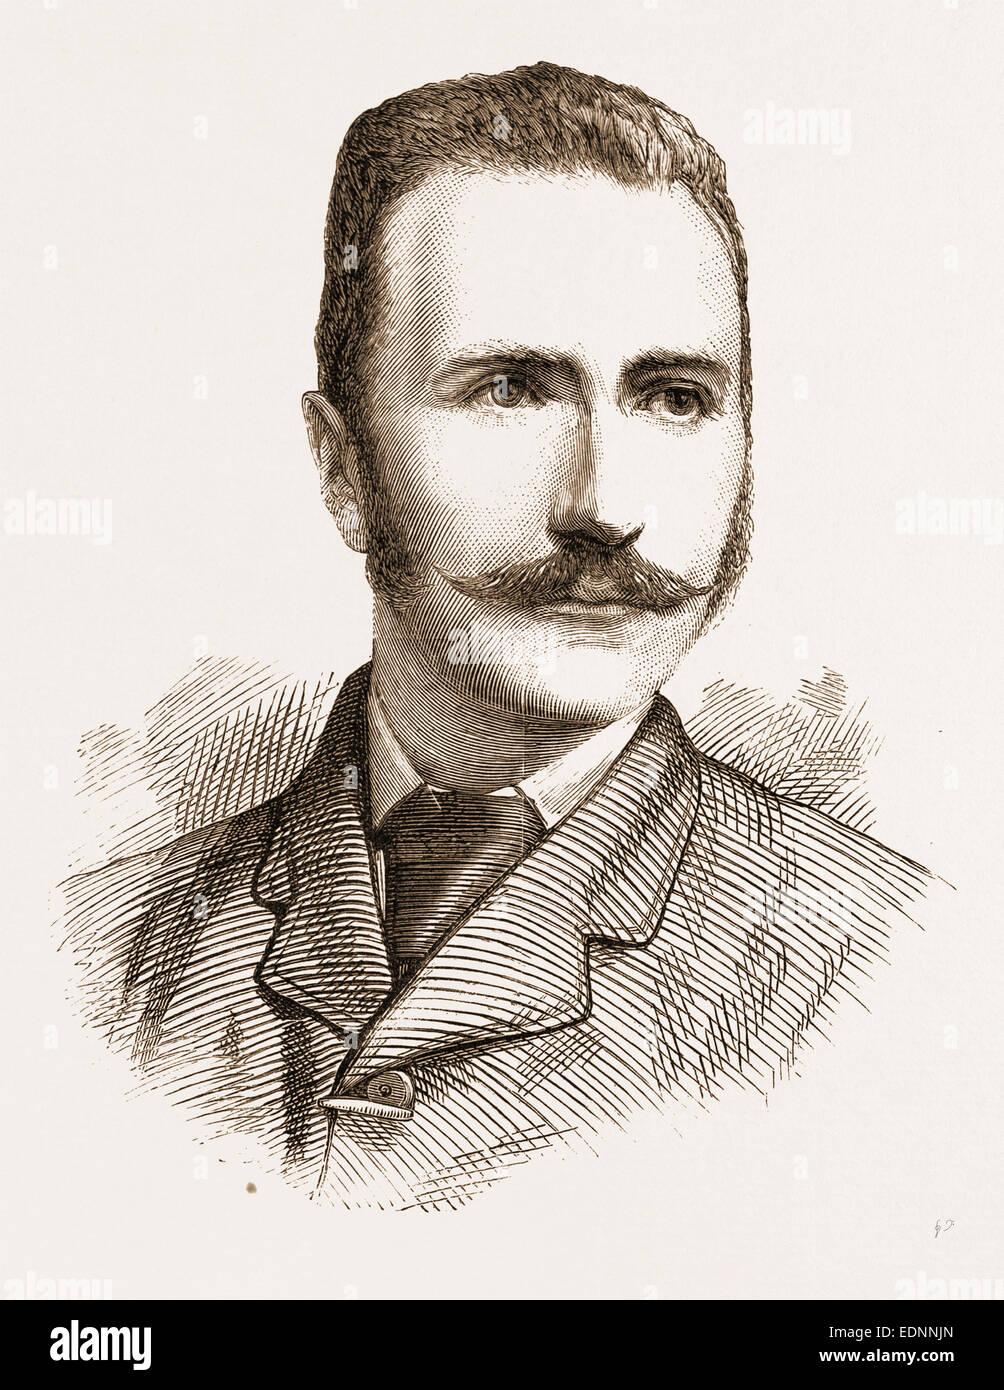 M R. J.A. CAMERON, 1881 - Stock Image